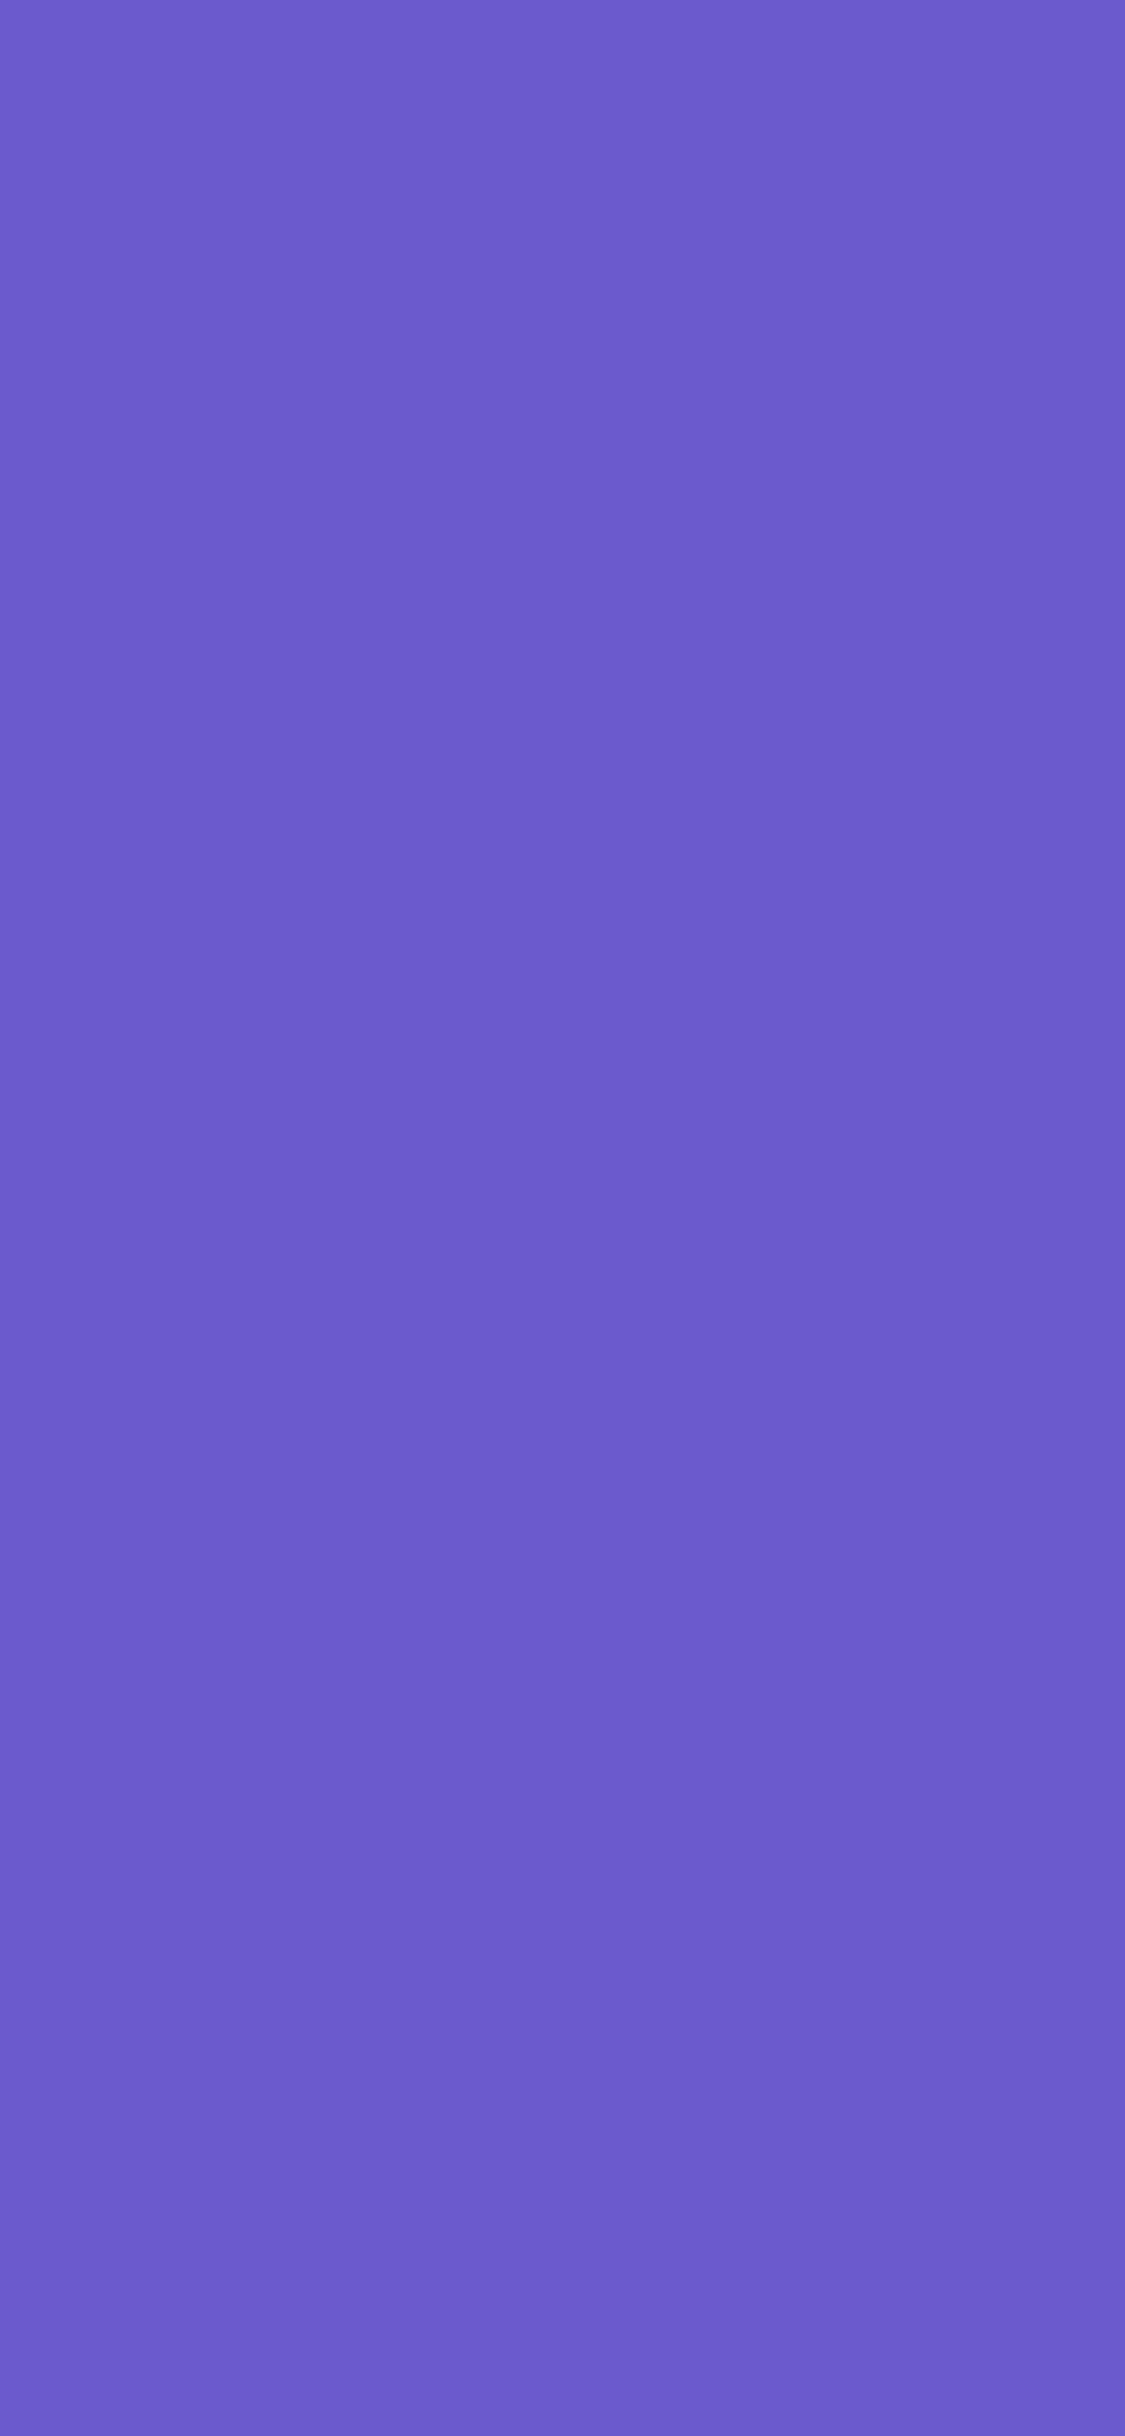 1125x2436 Slate Blue Solid Color Background